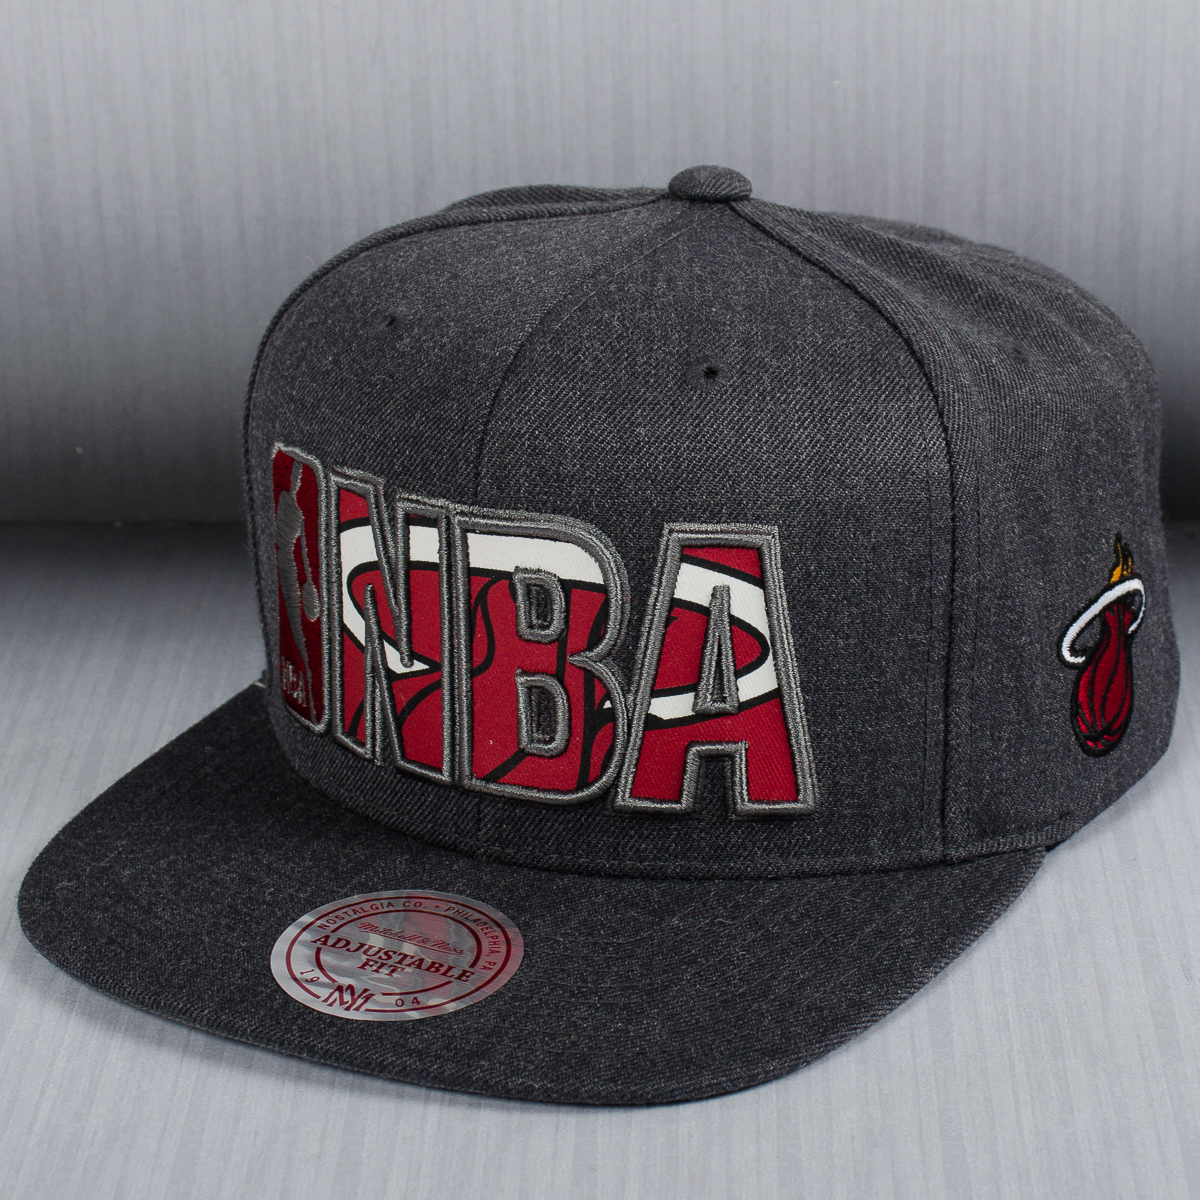 reputable site 31942 f65dd Mitchell   Ness NBA Miami Heat Insider Reflective Snapback Cap